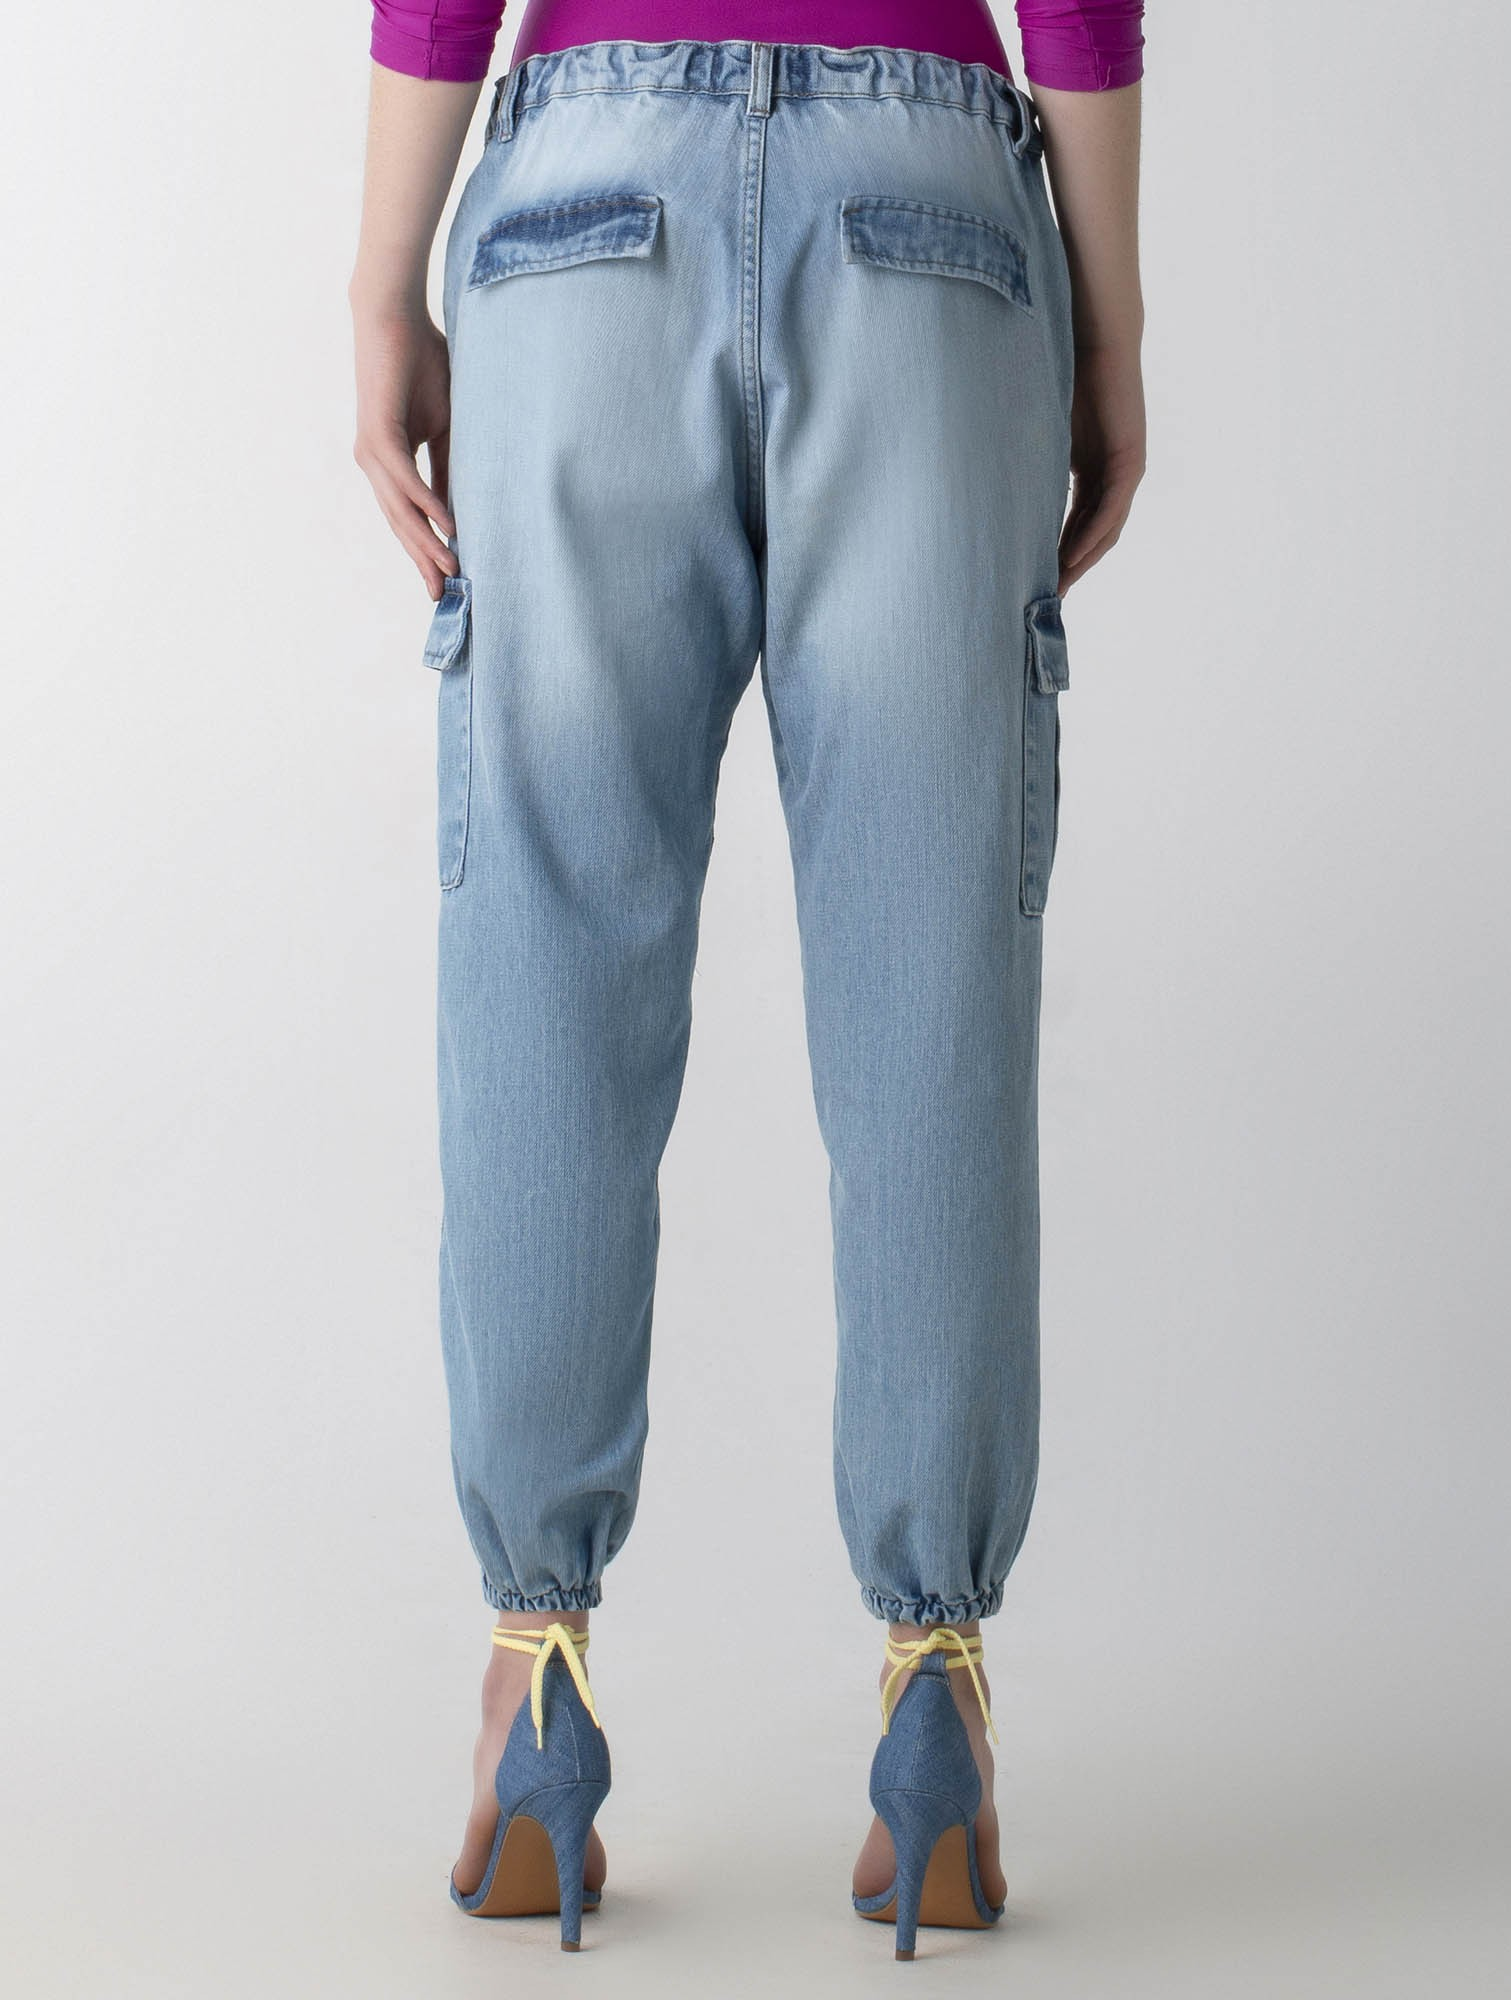 Calça jeans jogger - Wave